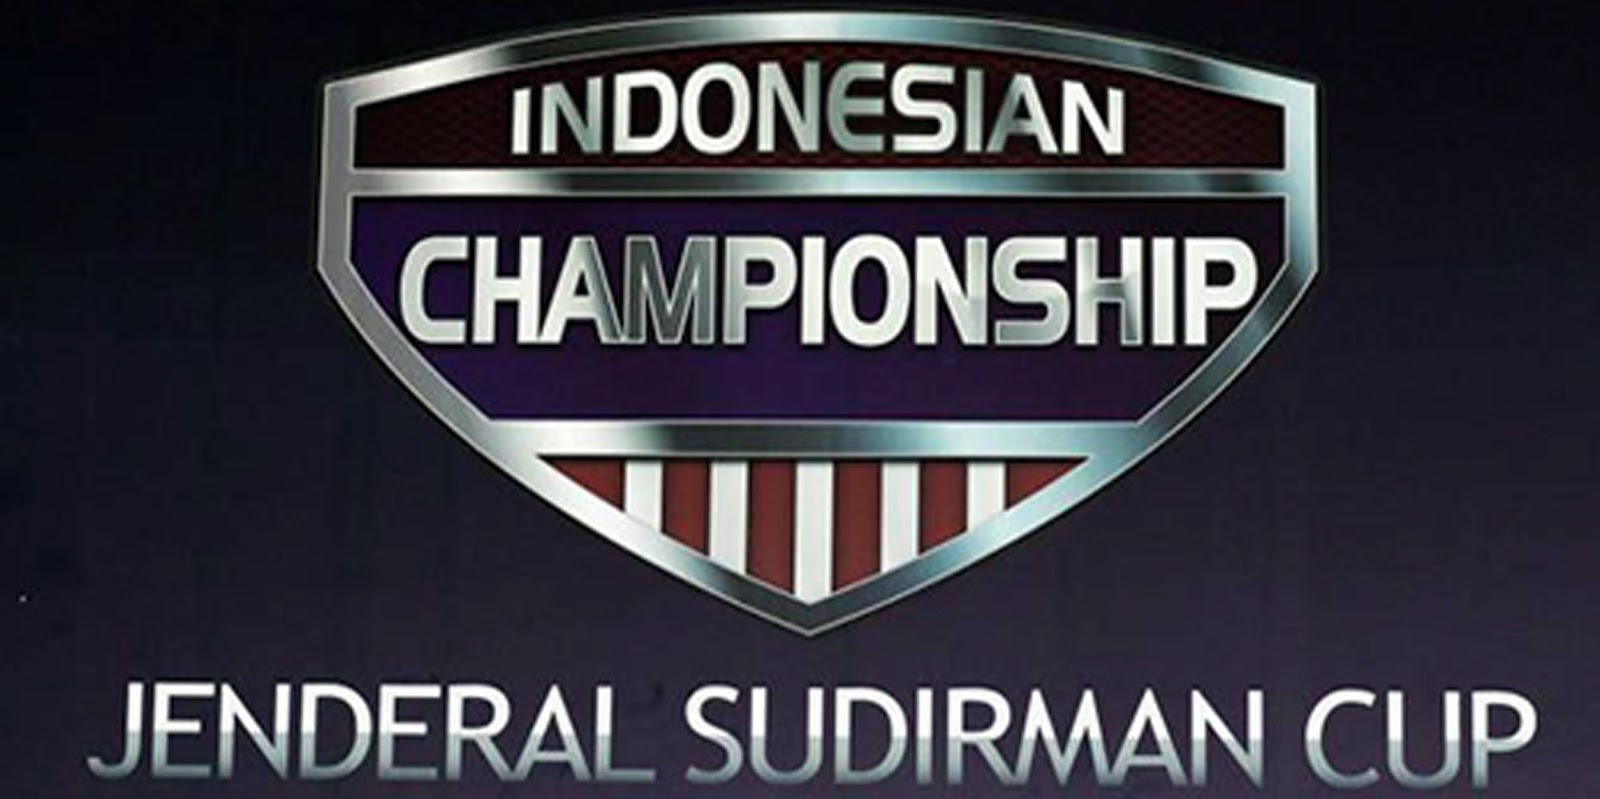 Jadwal Pertandingan Persib di Piala Jenderal Sudirman